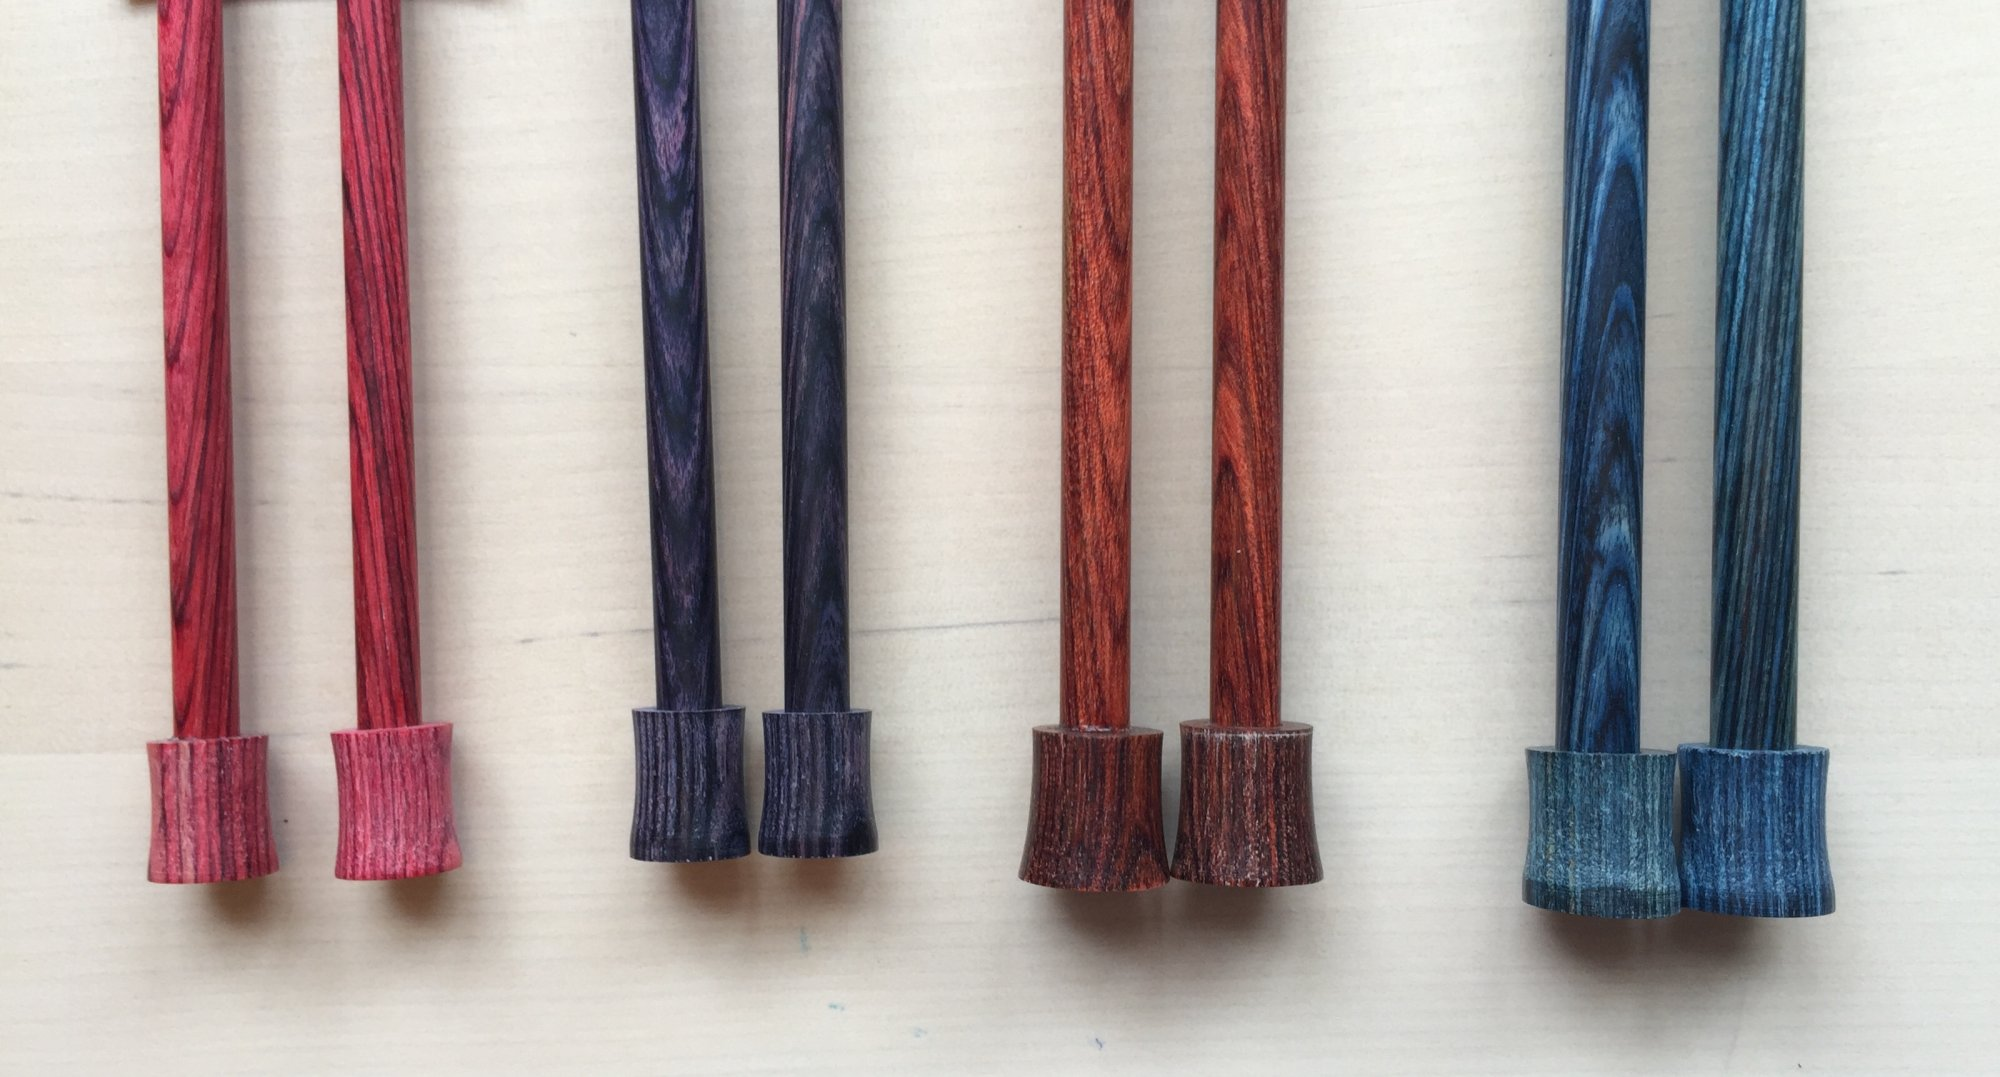 Dreamz 14 Straight Knitting Needles